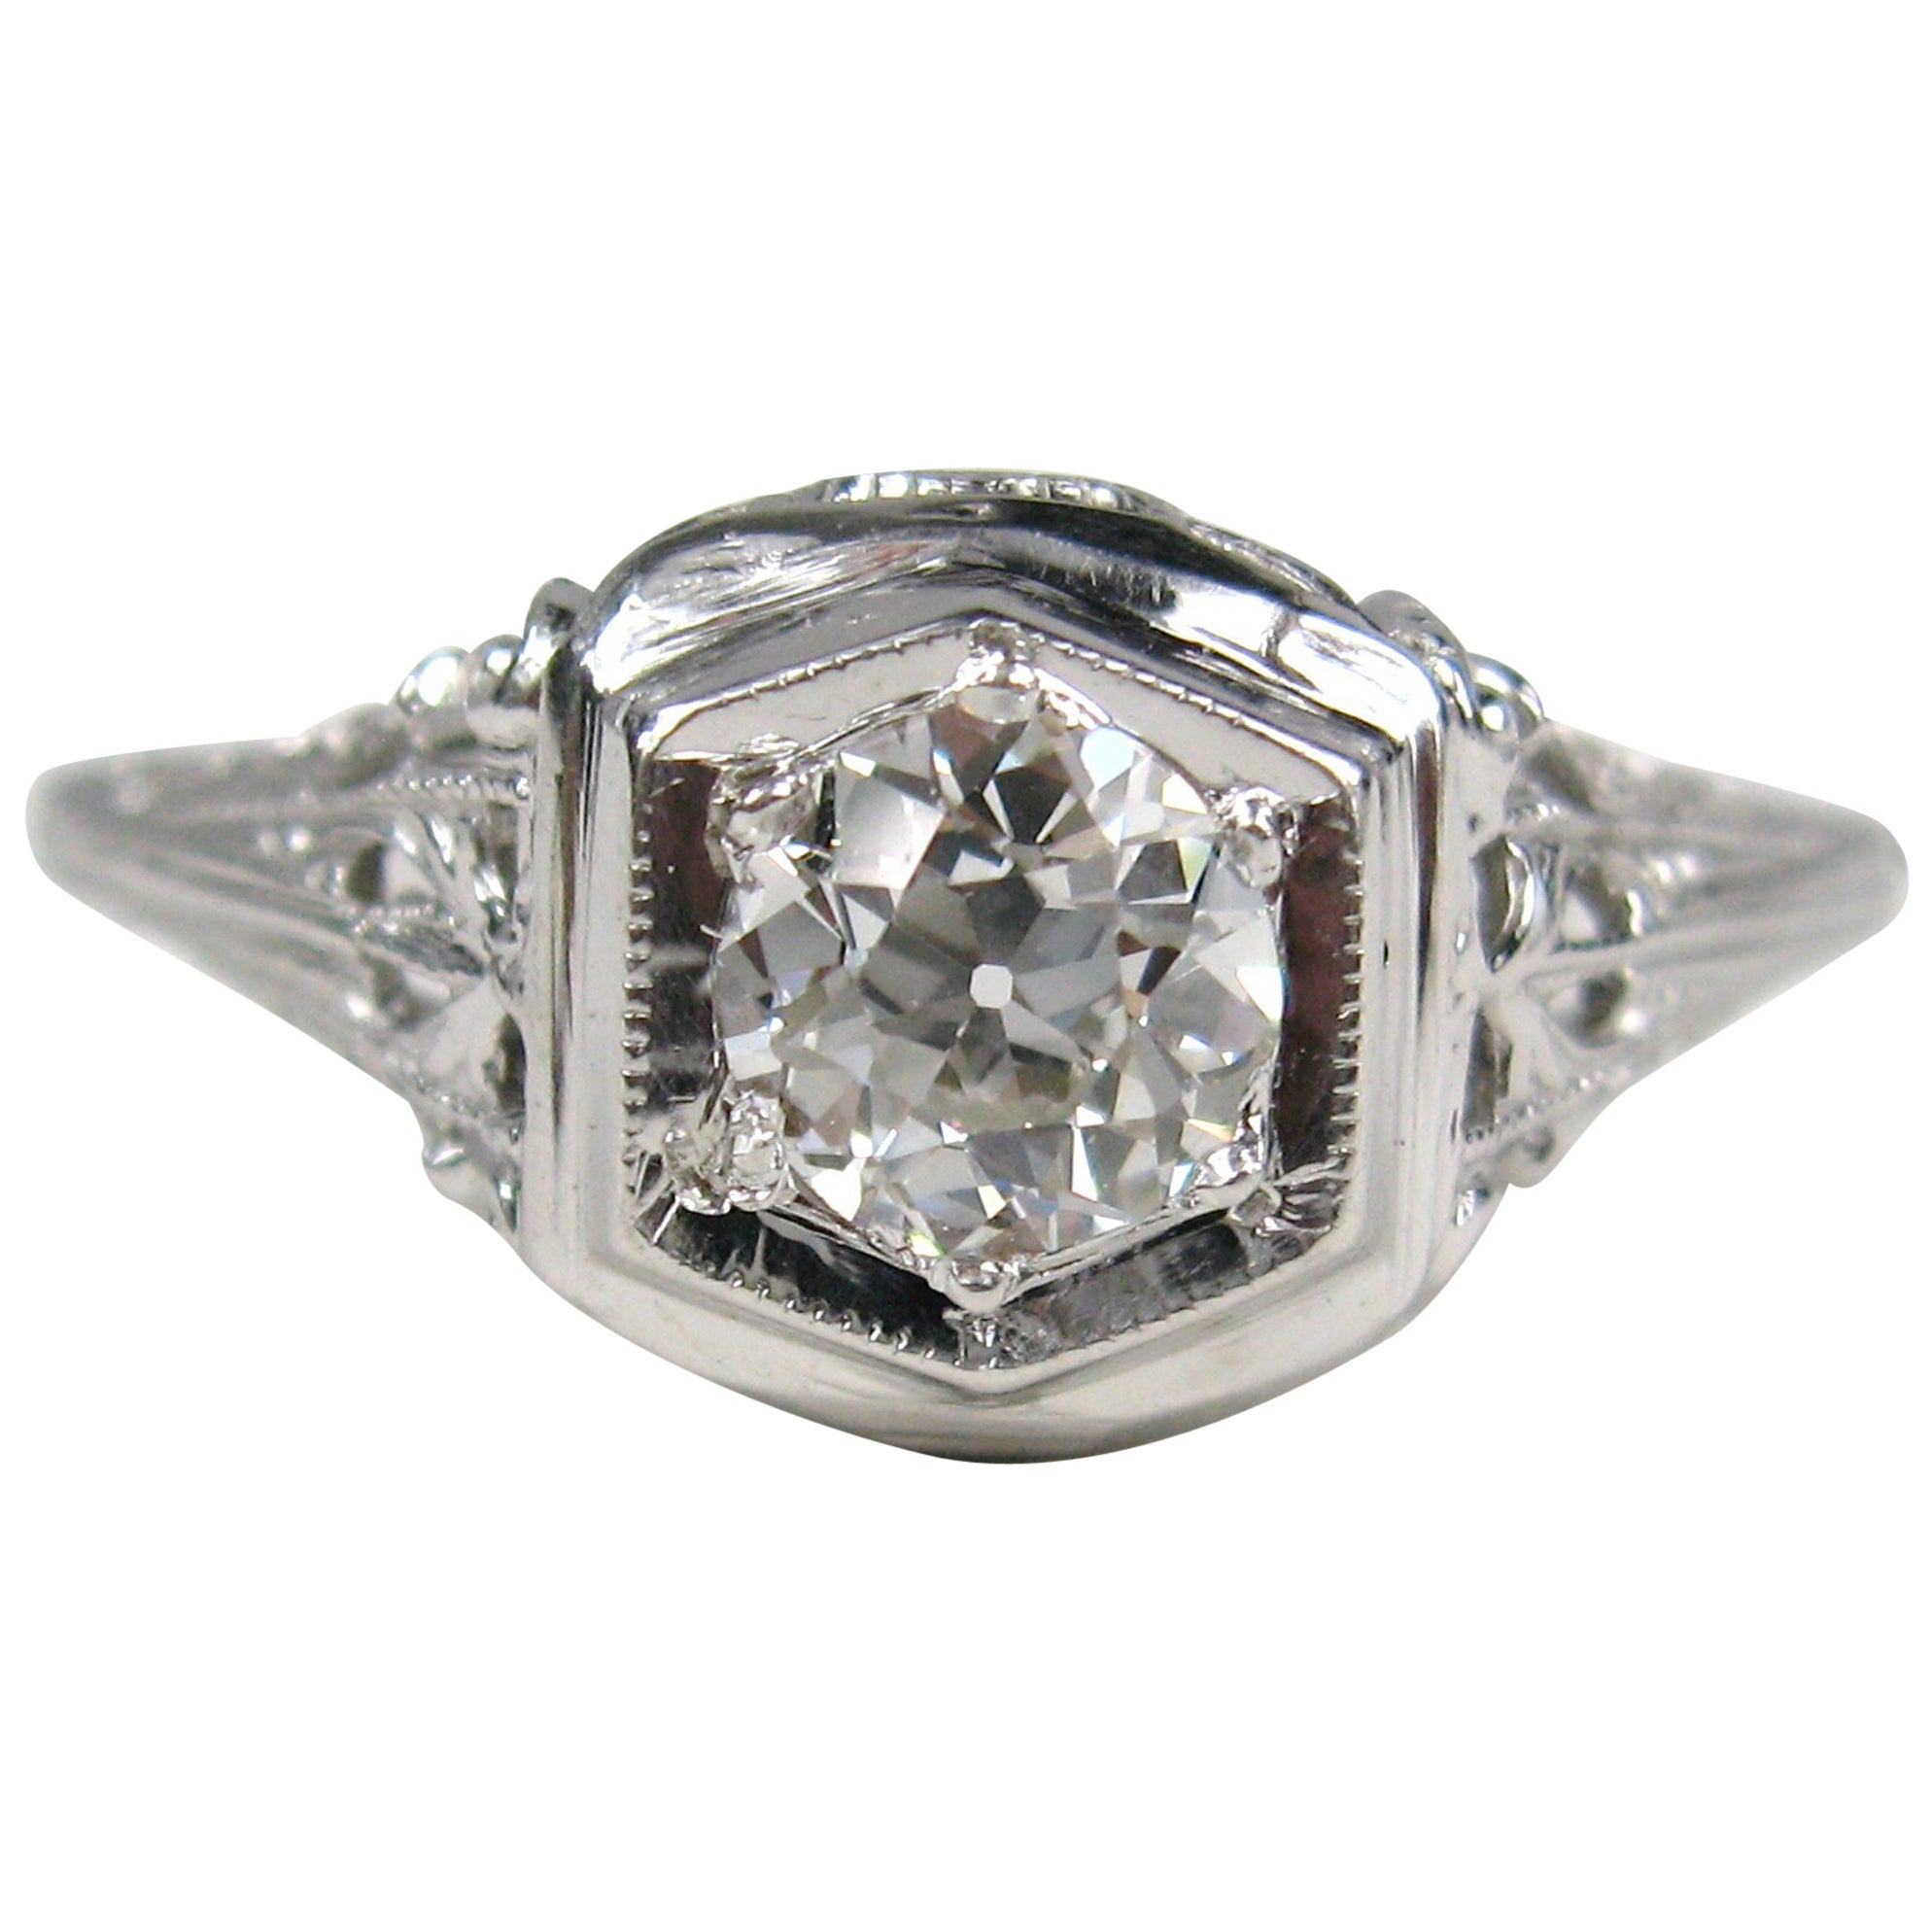 1920s White 14 Karat Gold Art Deco Engagement Diamond Ring